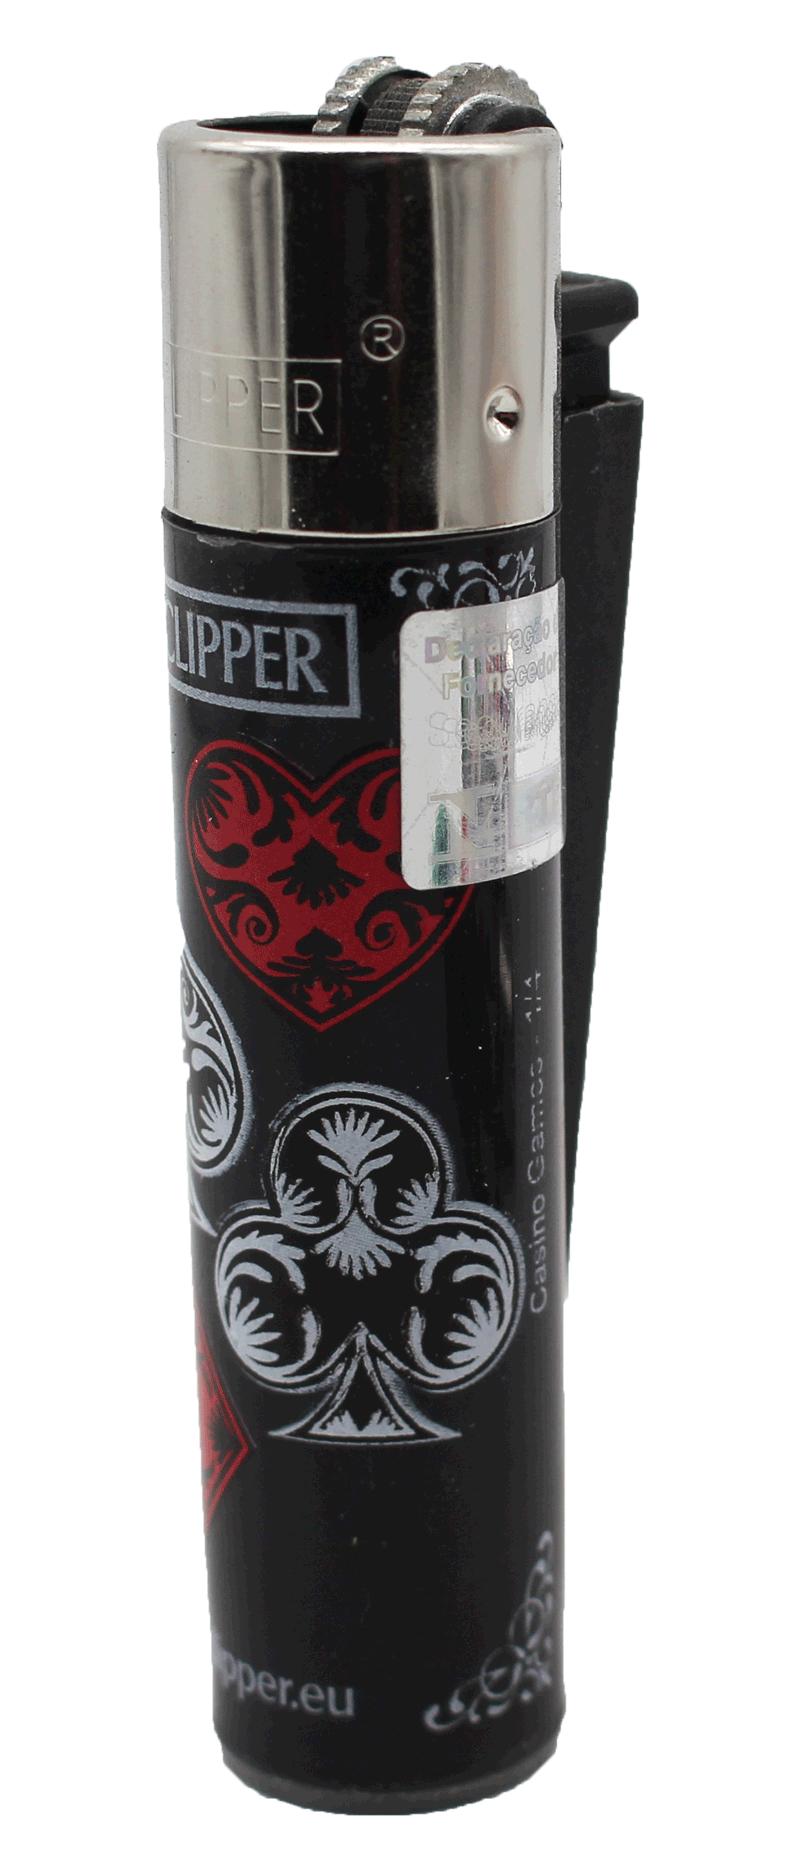 Isqueiro Clipper Maxi Collect Cassino